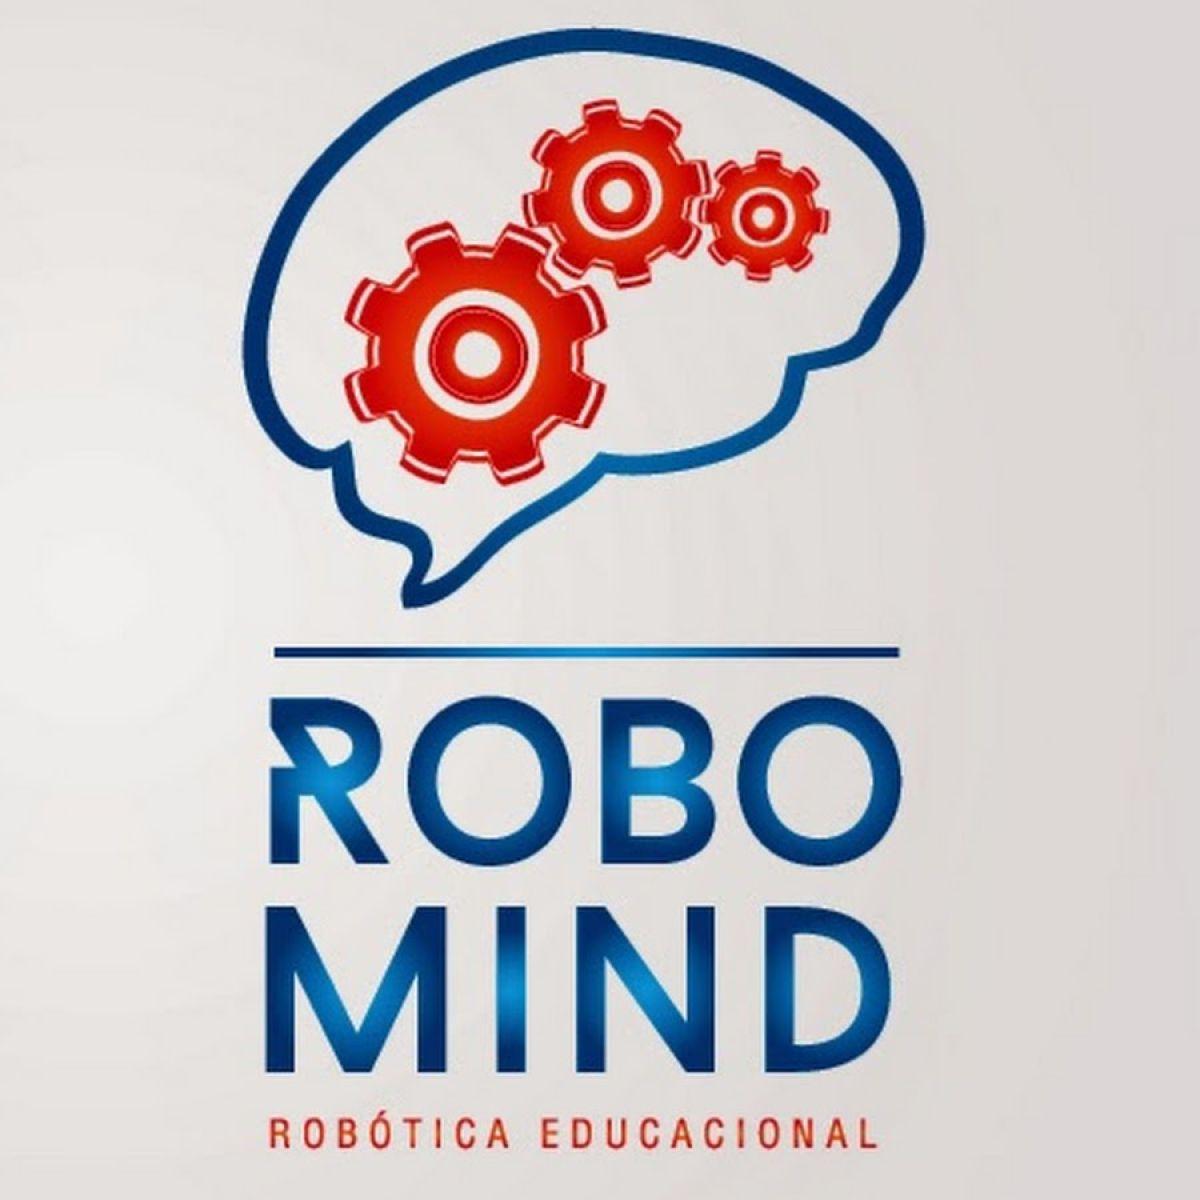 ROBOMIND ROBÓTICA EDUCACIONAL